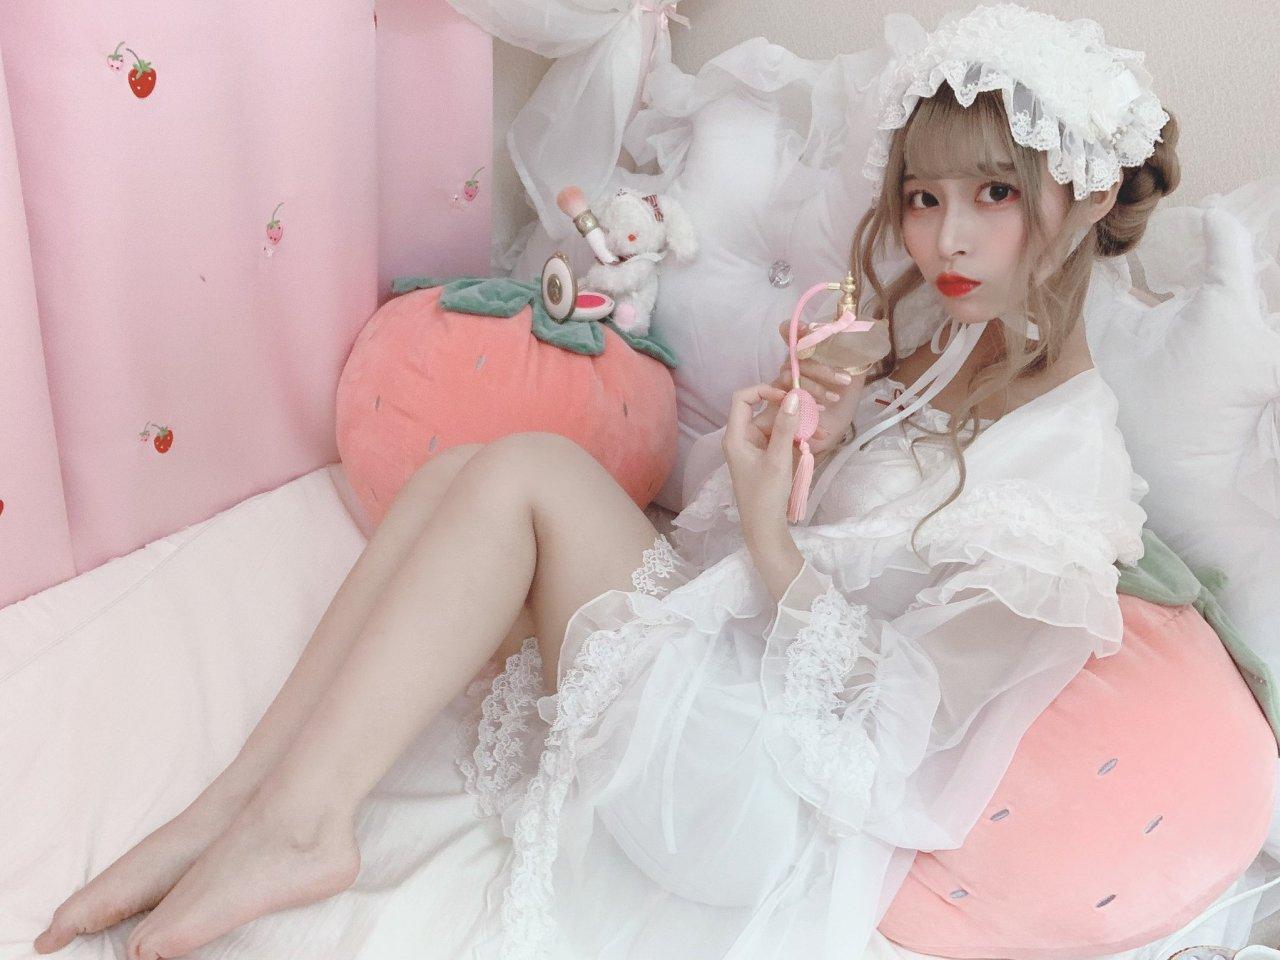 #Mimi#Mimi maid#Larme#Larme kei#Antique kei#Japanese Fashion